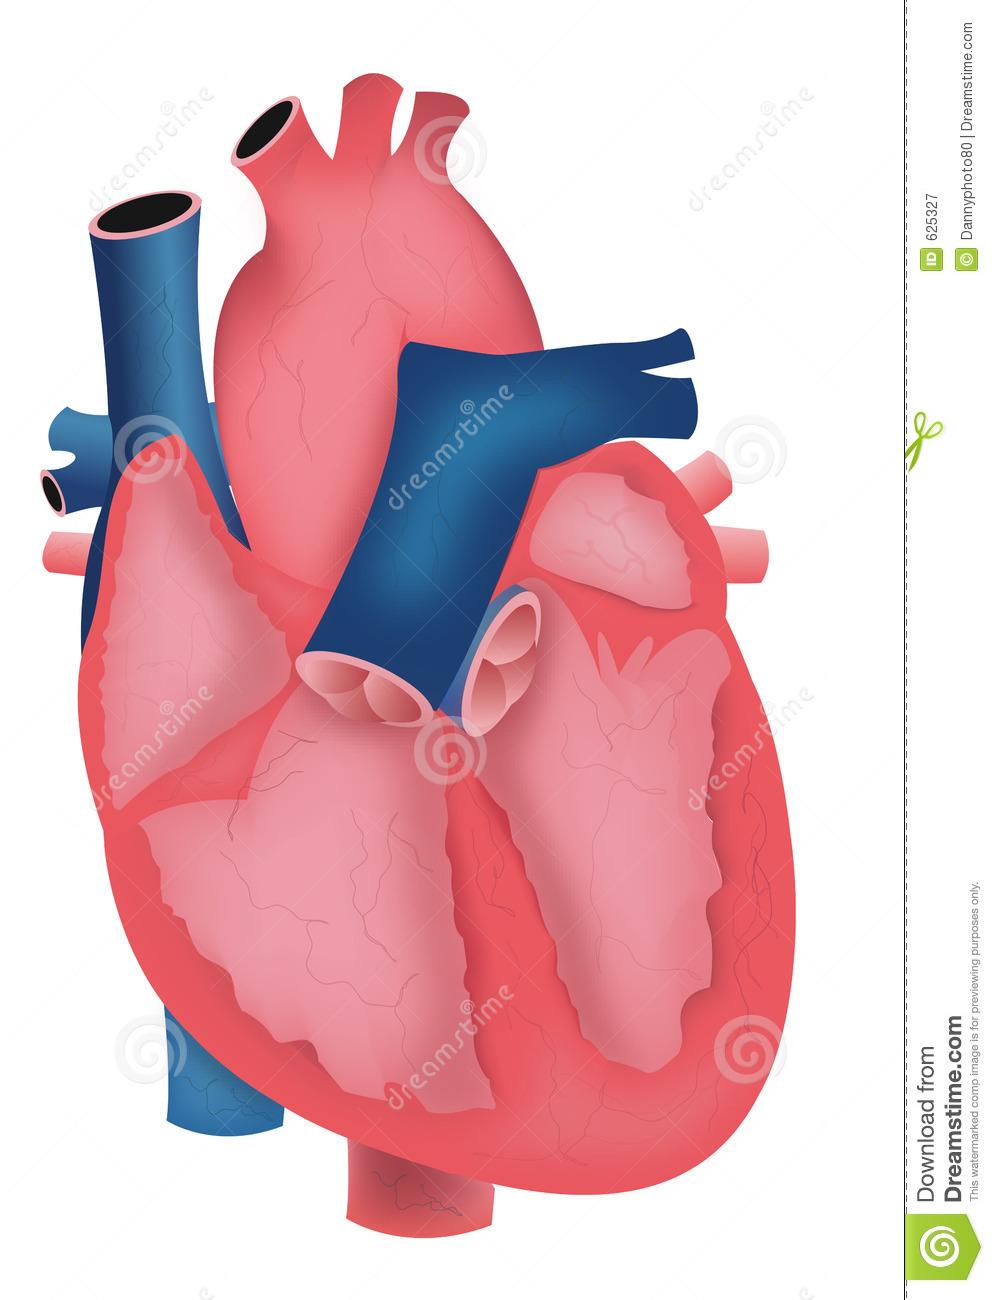 human heart clipart viewing clipart panda free clipart images rh clipartpanda com real heart clipart black and white Heart Clip Art